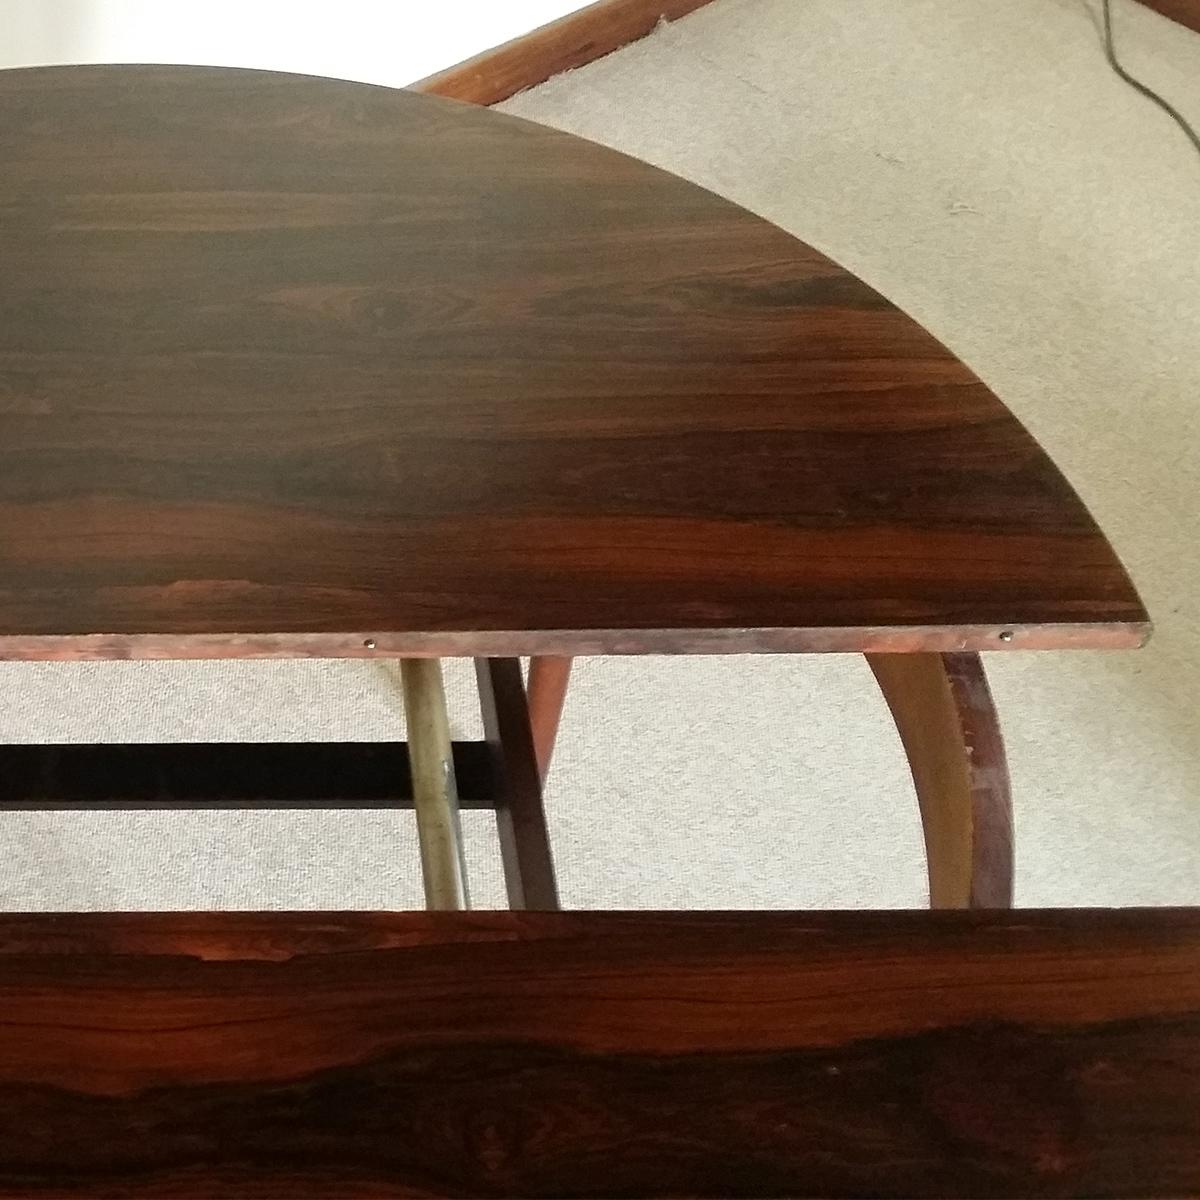 Rosewood dining table Artichoke Vintage Furniture : rosewoode dining table6 from artichokevintagefurniture.com size 1200 x 1200 jpeg 580kB